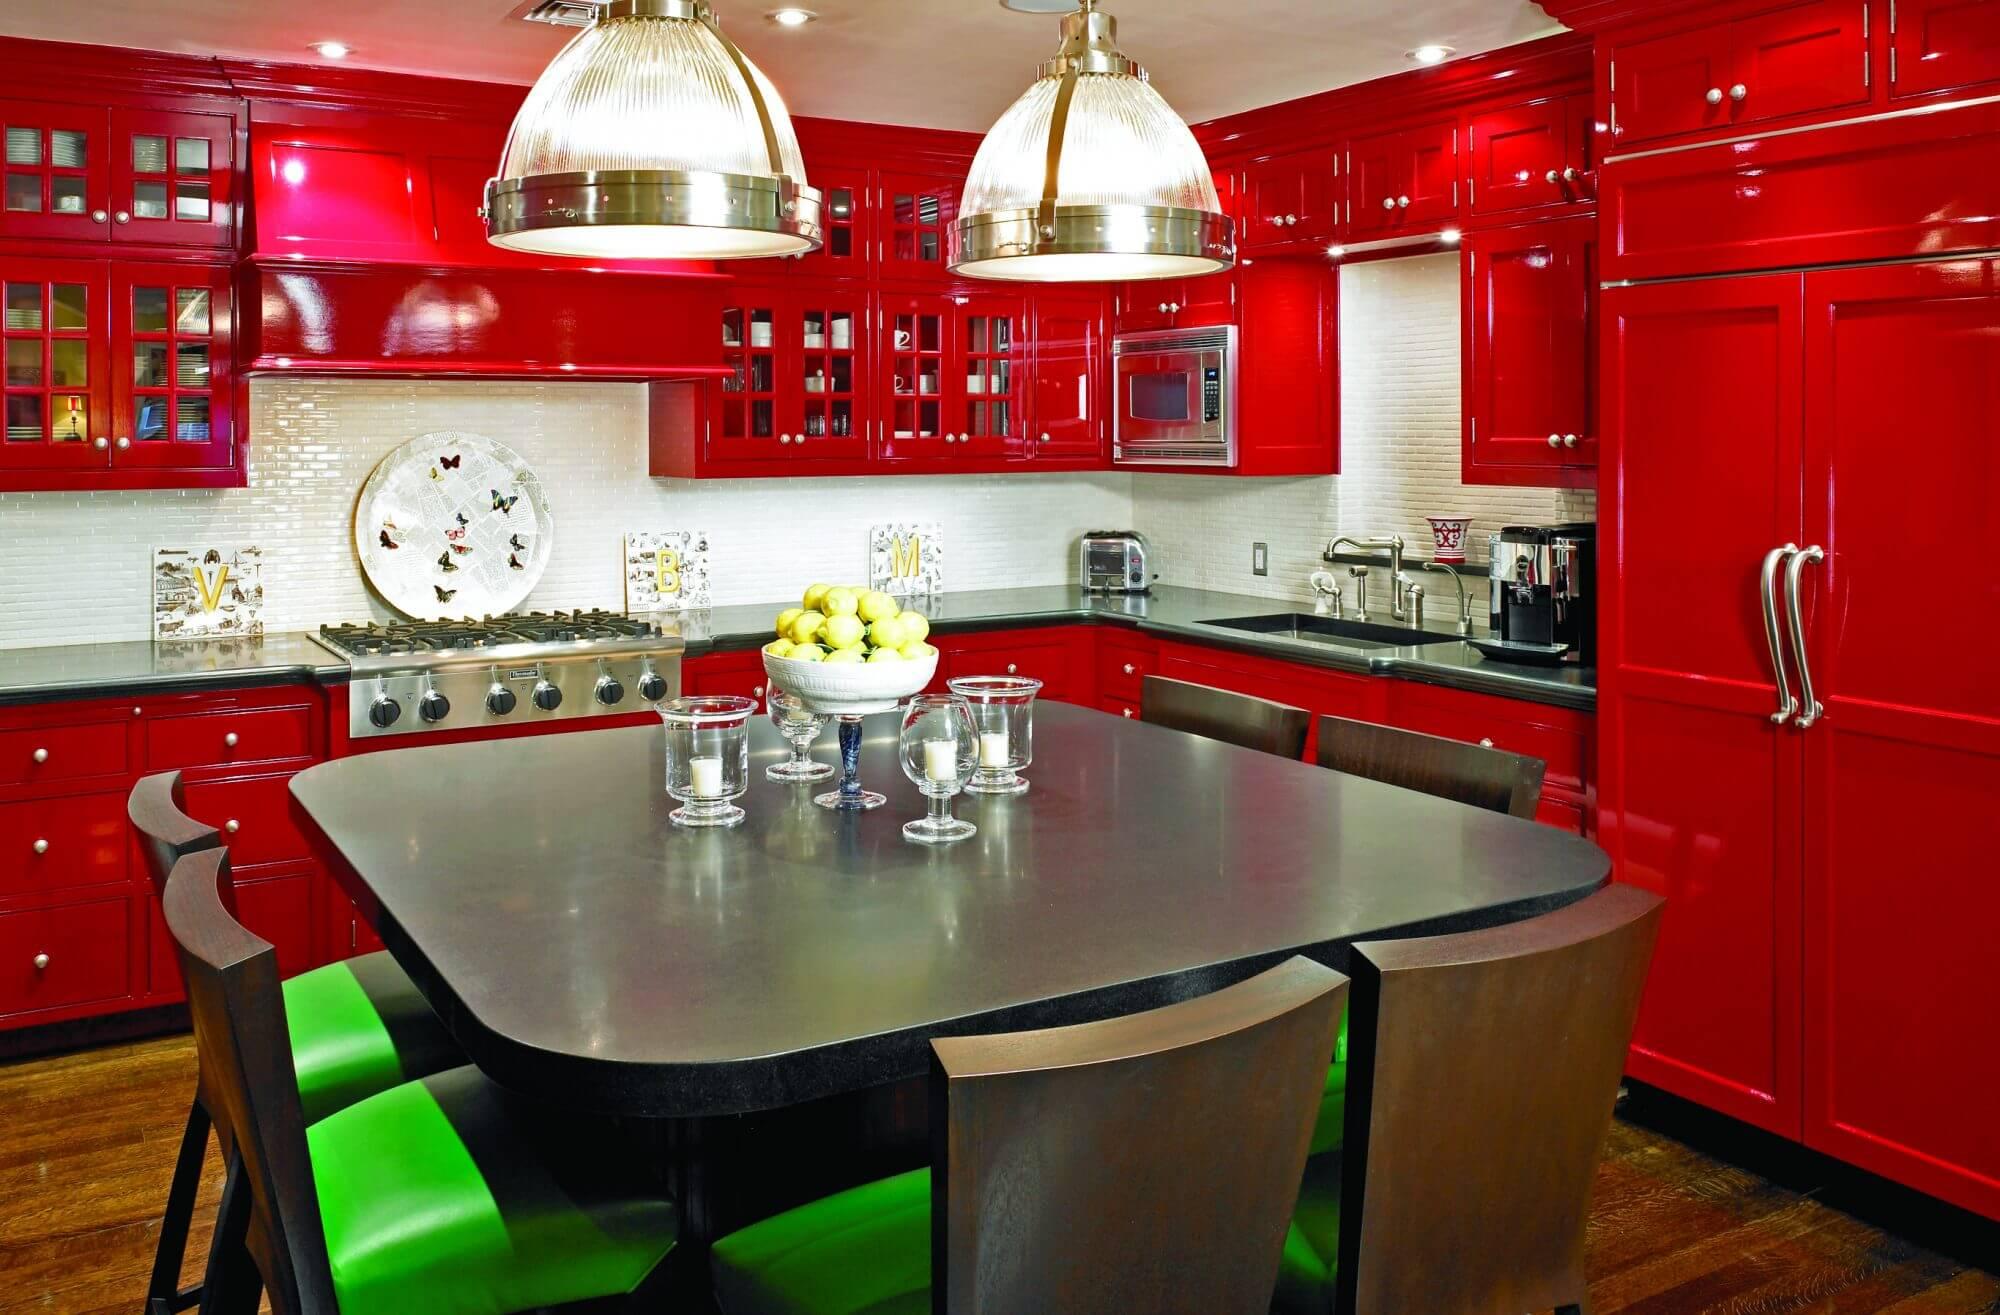 Kitchen Painting - Cabinet Painting & Refinishing ...